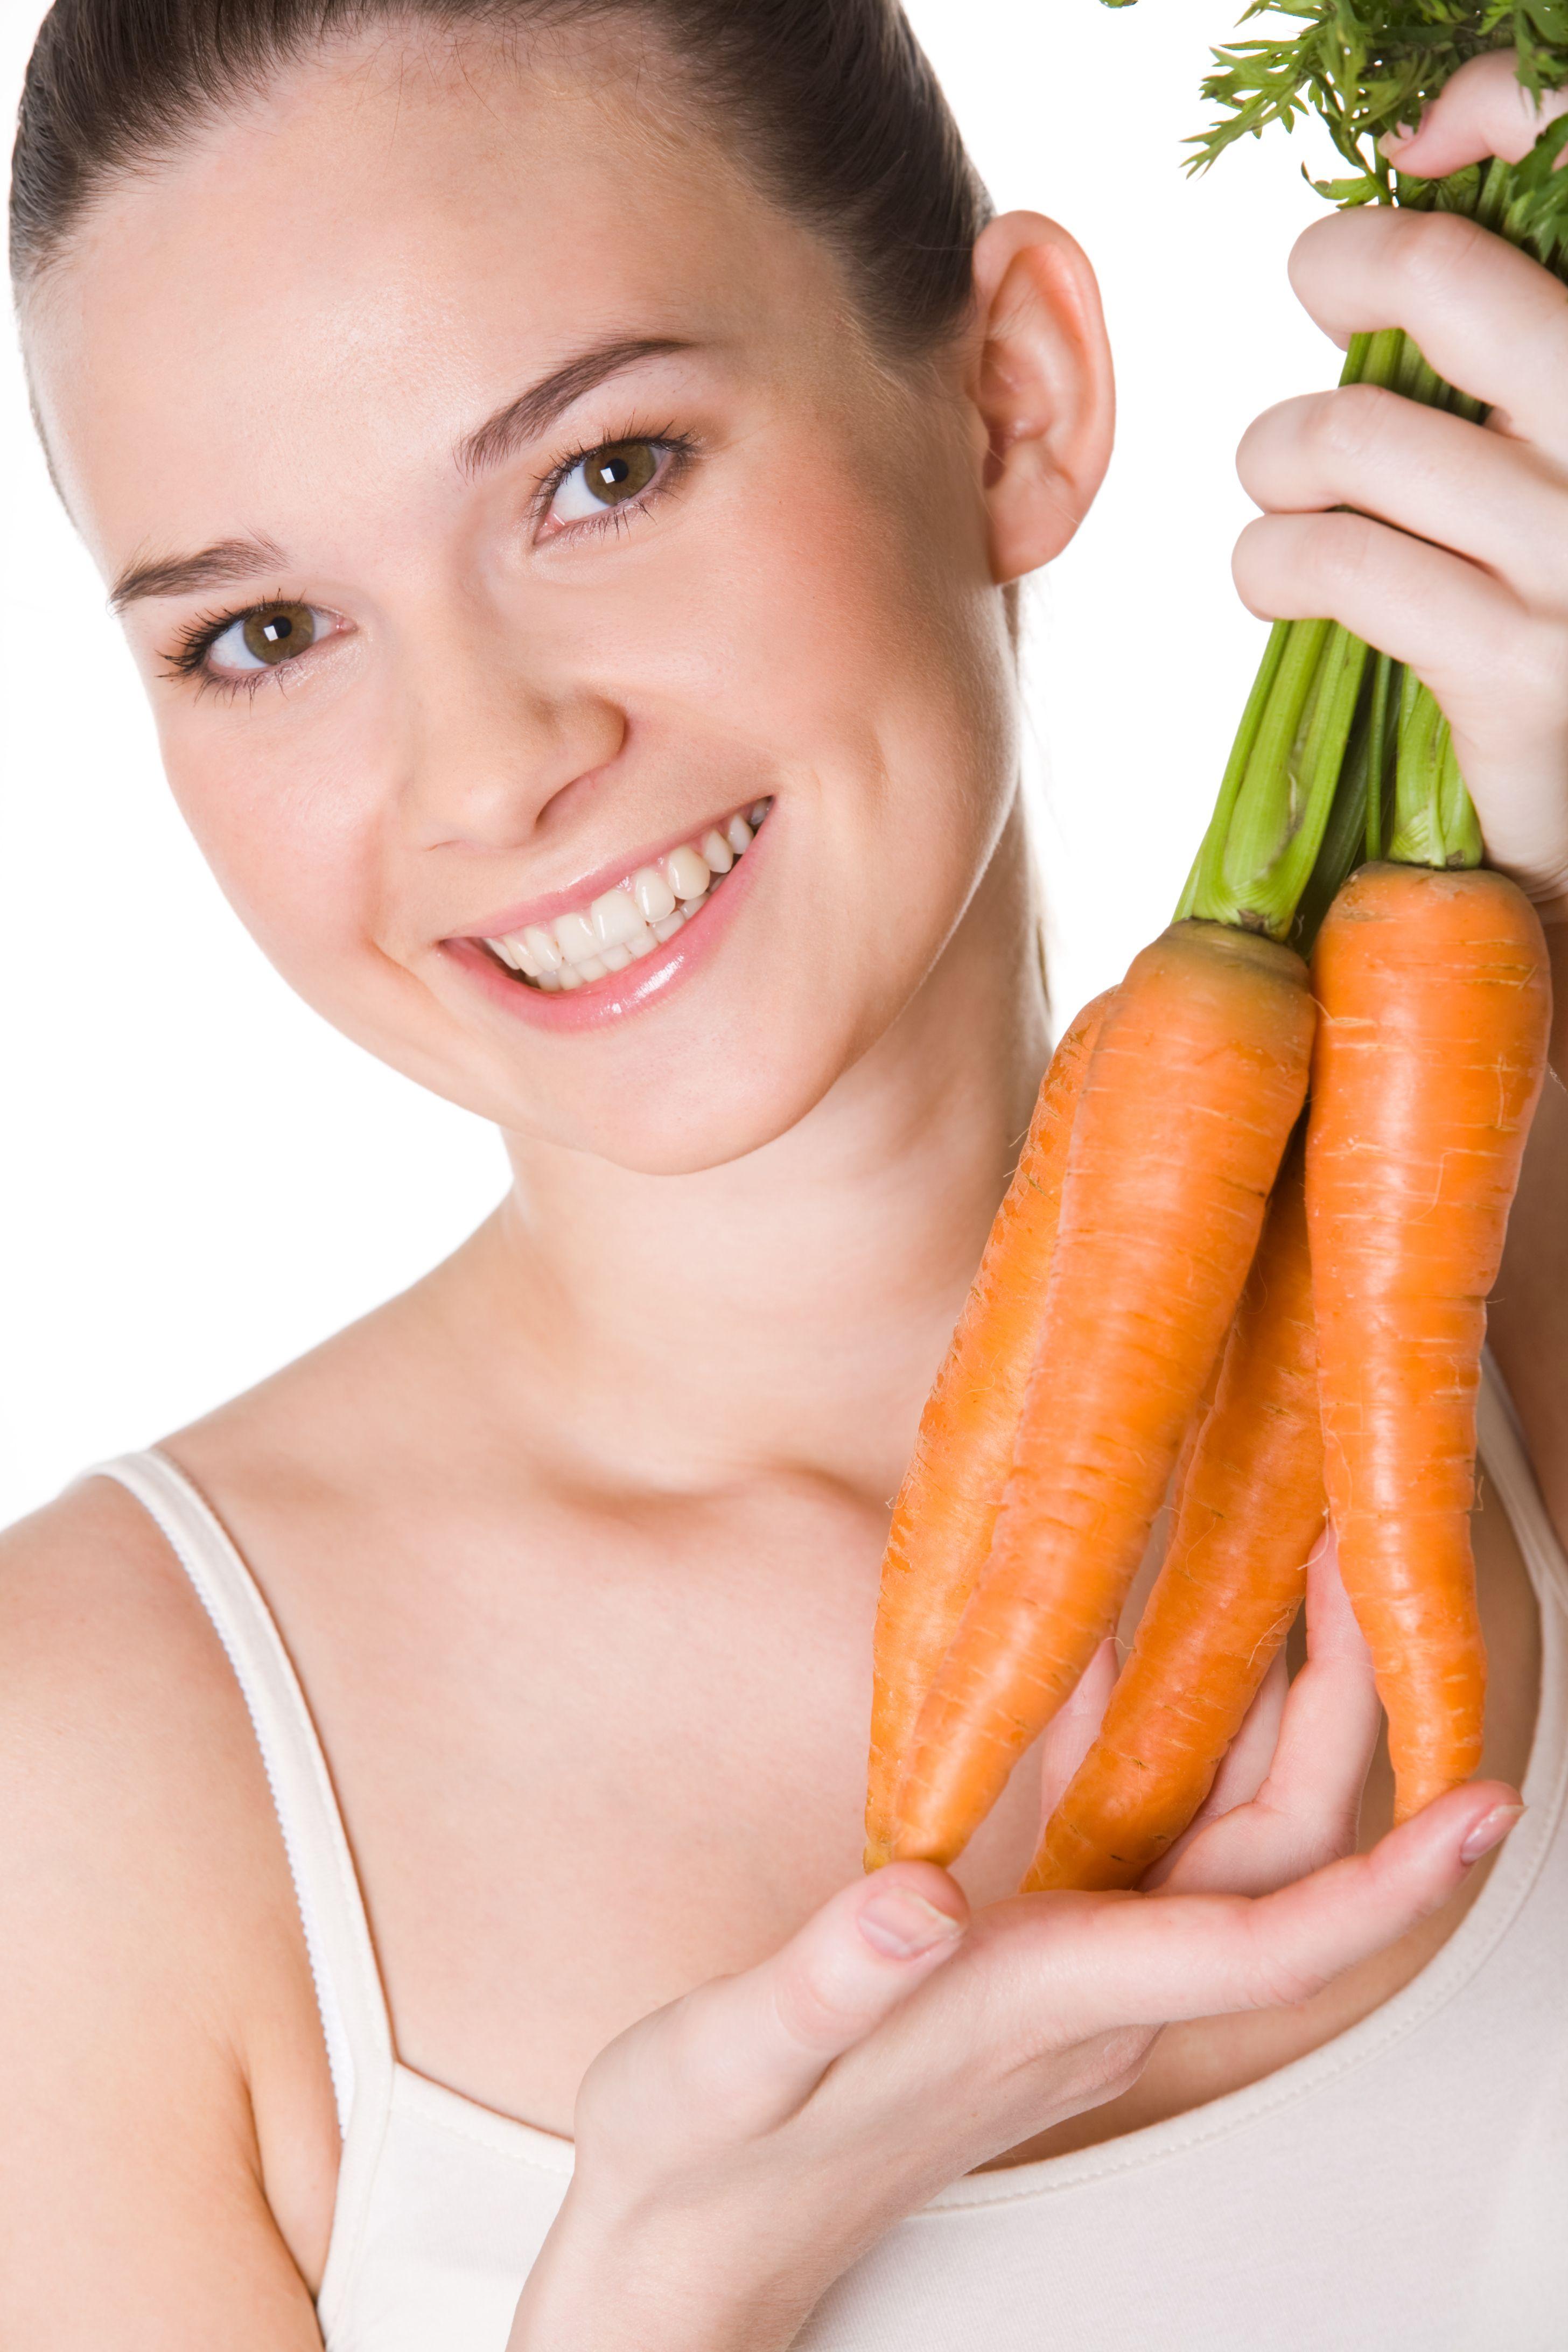 Benefits of carrots facial use